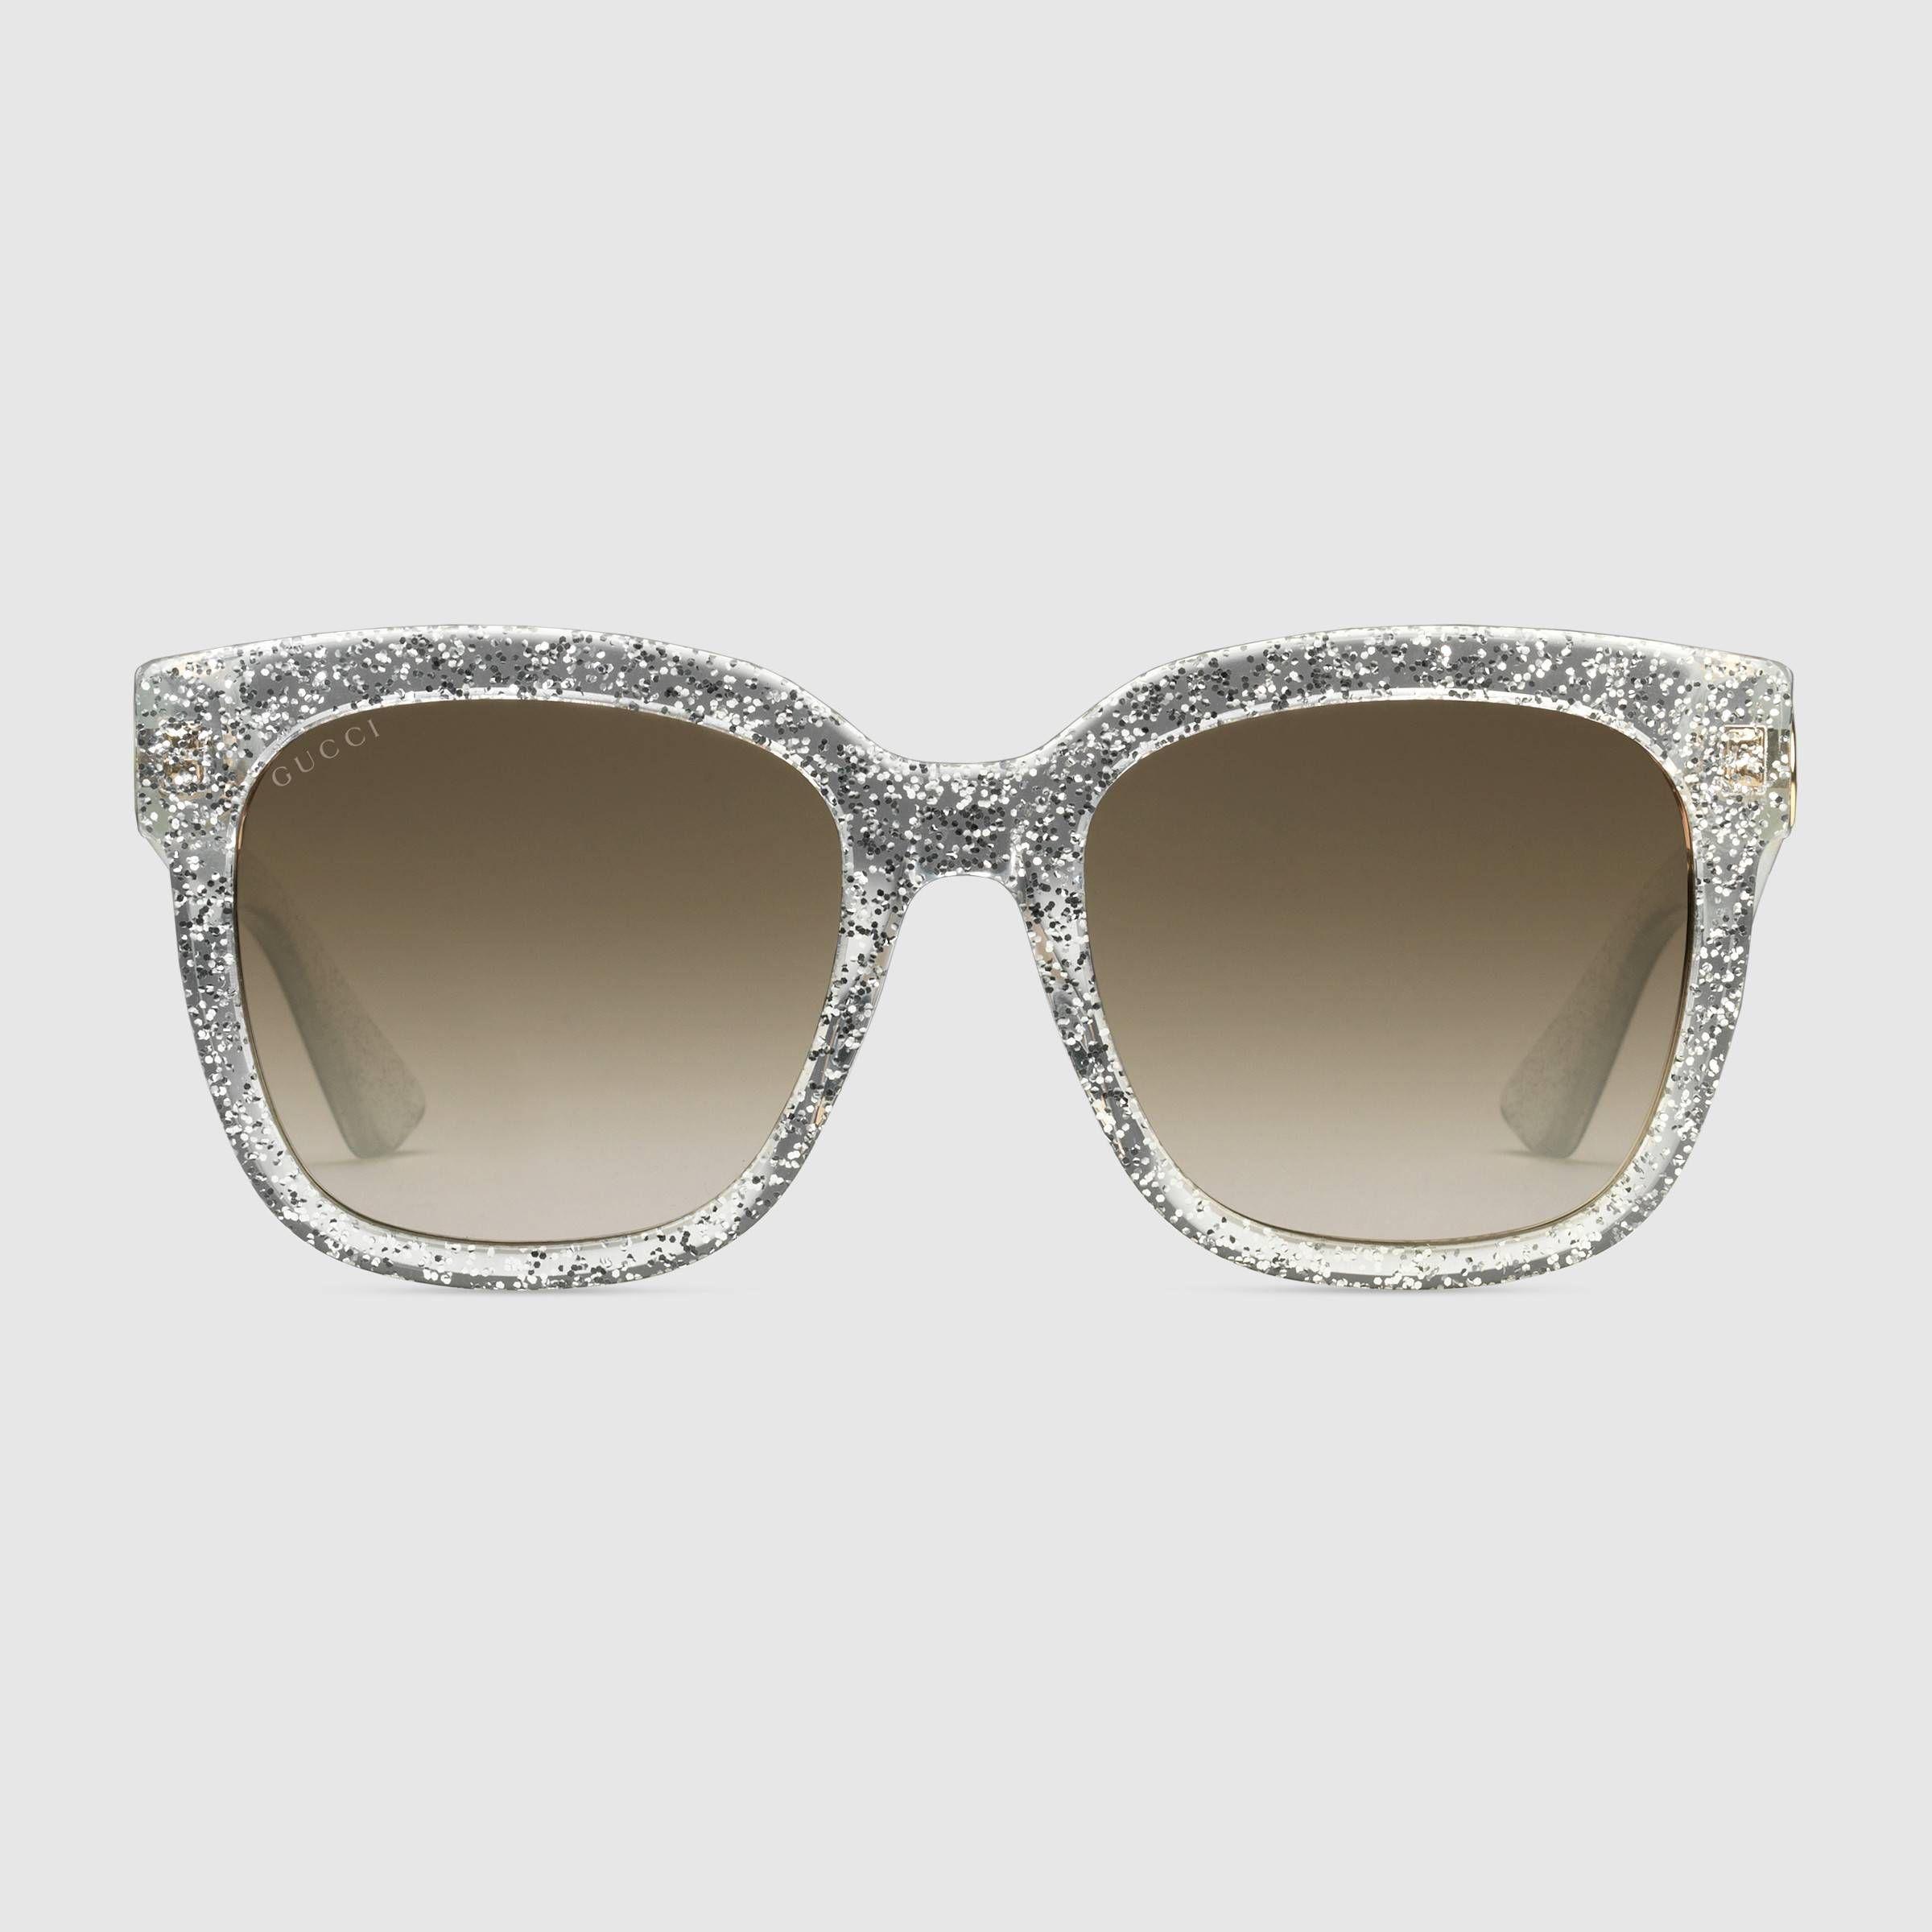 490b51d4a8 Gucci Glitter Sunglasses